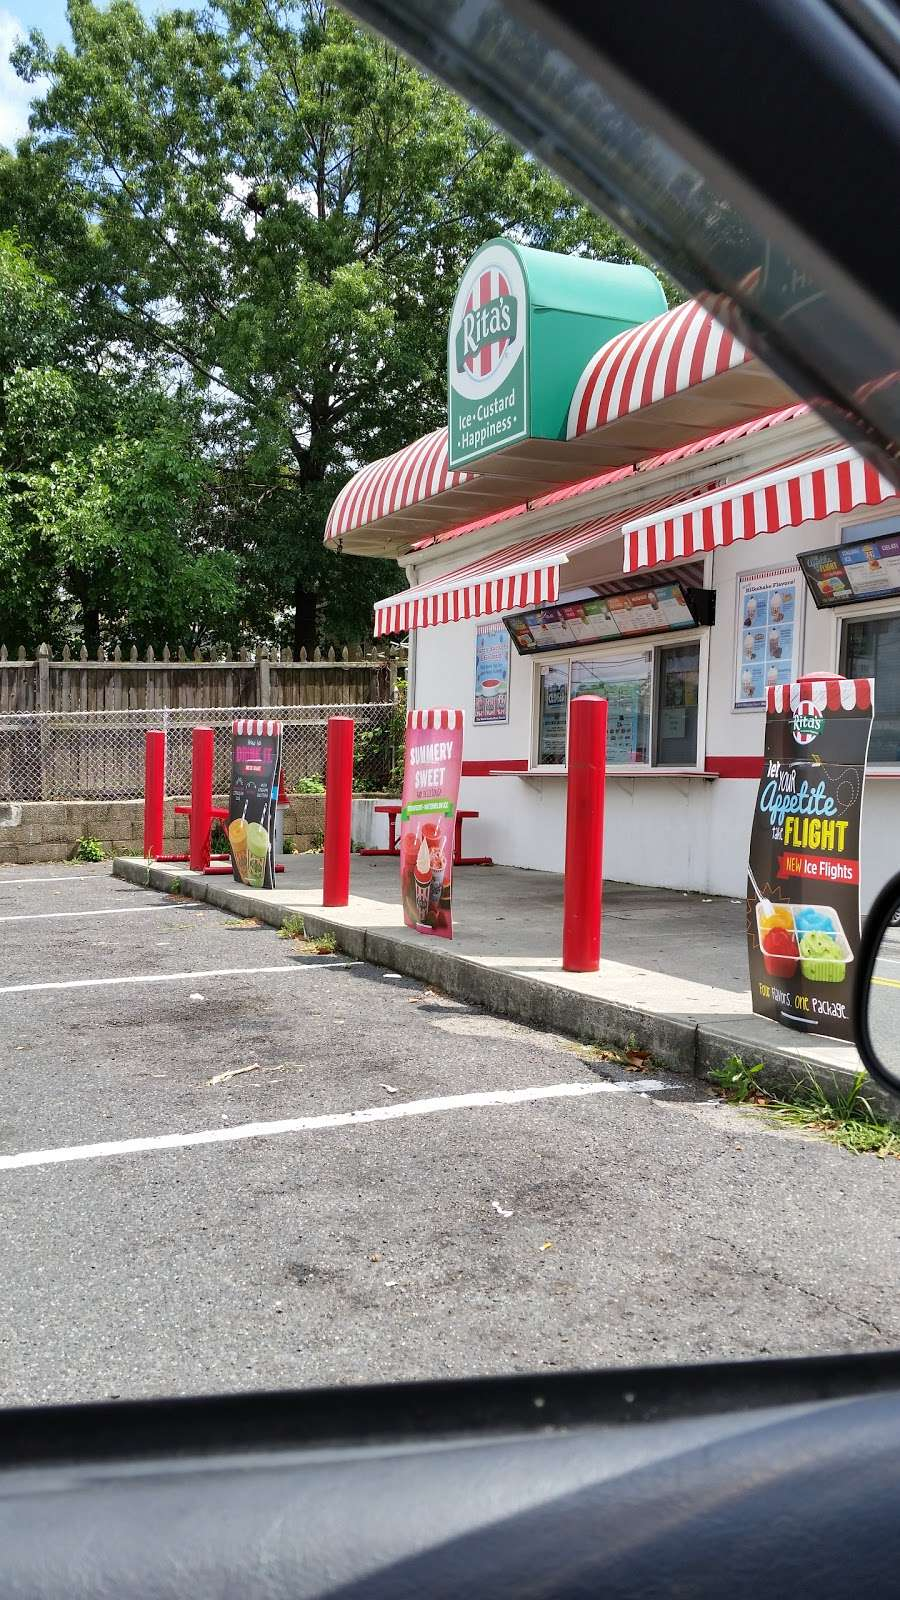 Ritas Italian Ice - store    Photo 1 of 10   Address: 50 River Rd, North Arlington, NJ 07031, USA   Phone: (201) 428-1356